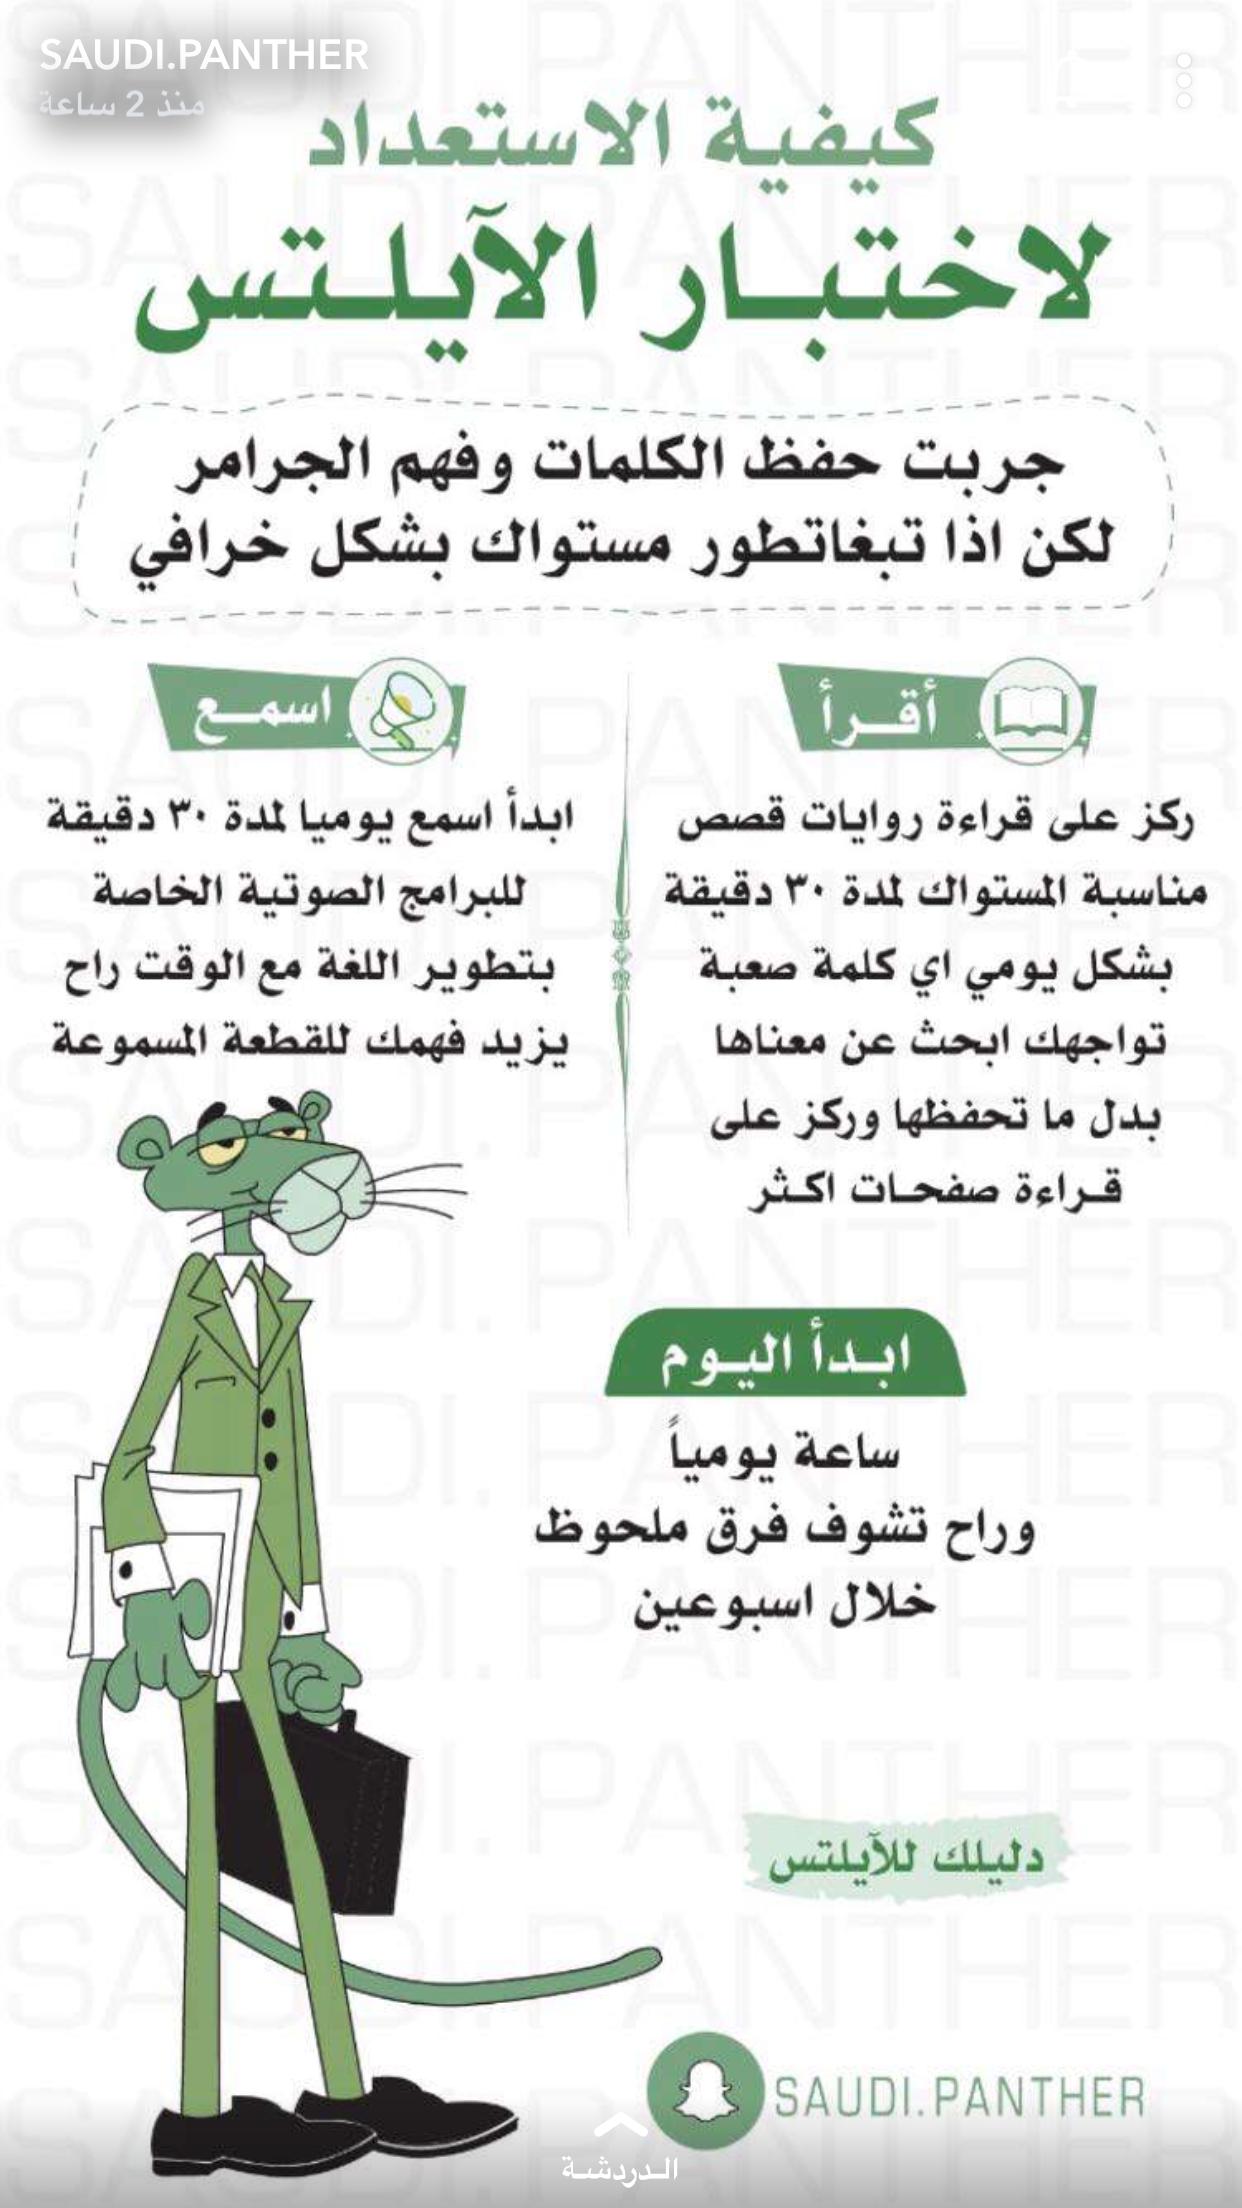 Pin By Majd On خبرات ونجاح English Writing Skills Learn English English Language Learning